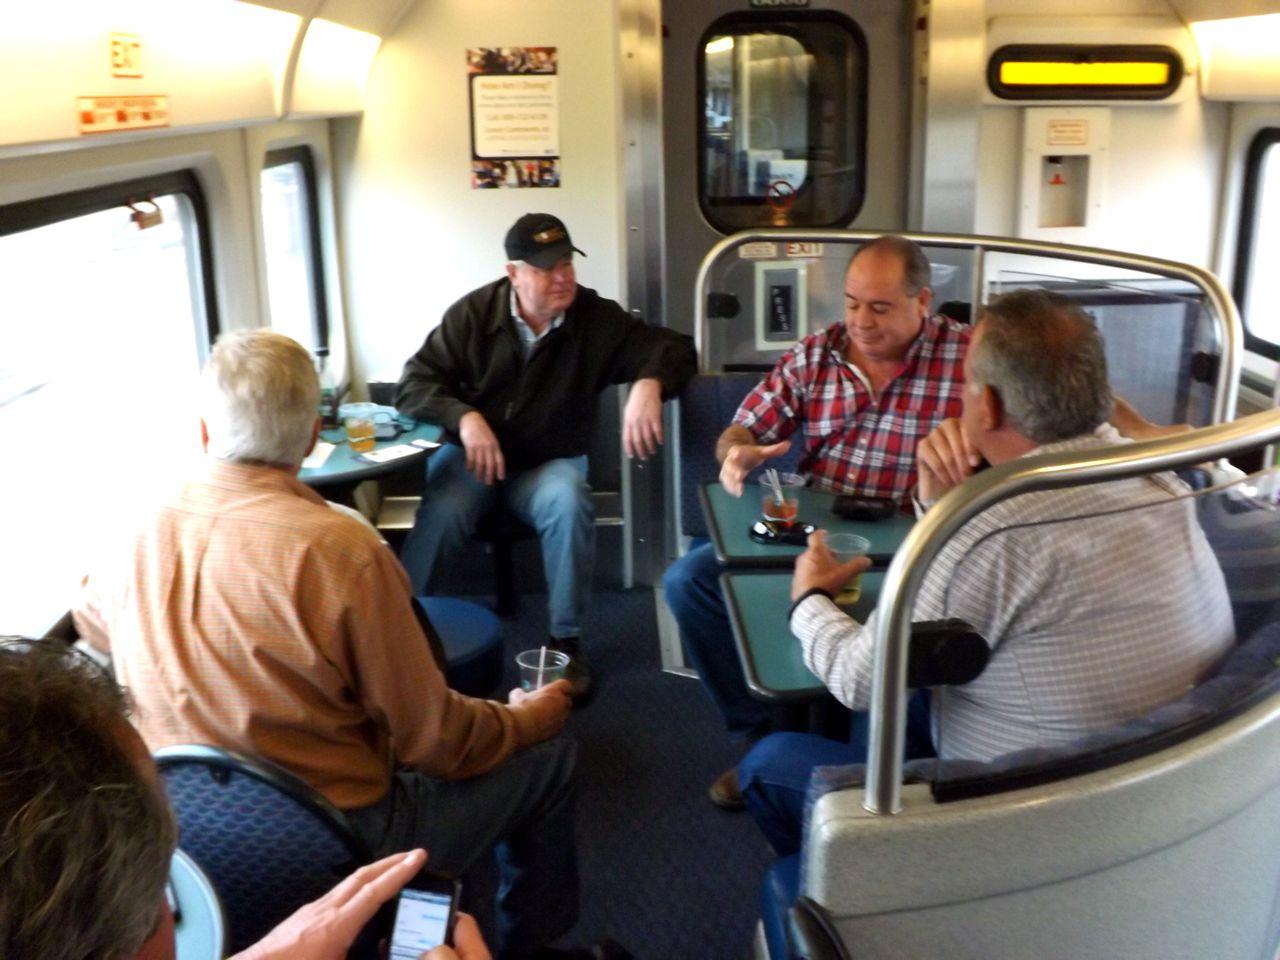 Passengers_in_Amtrak_lounge_car_of_San_Joaquin_train_2014.jpg